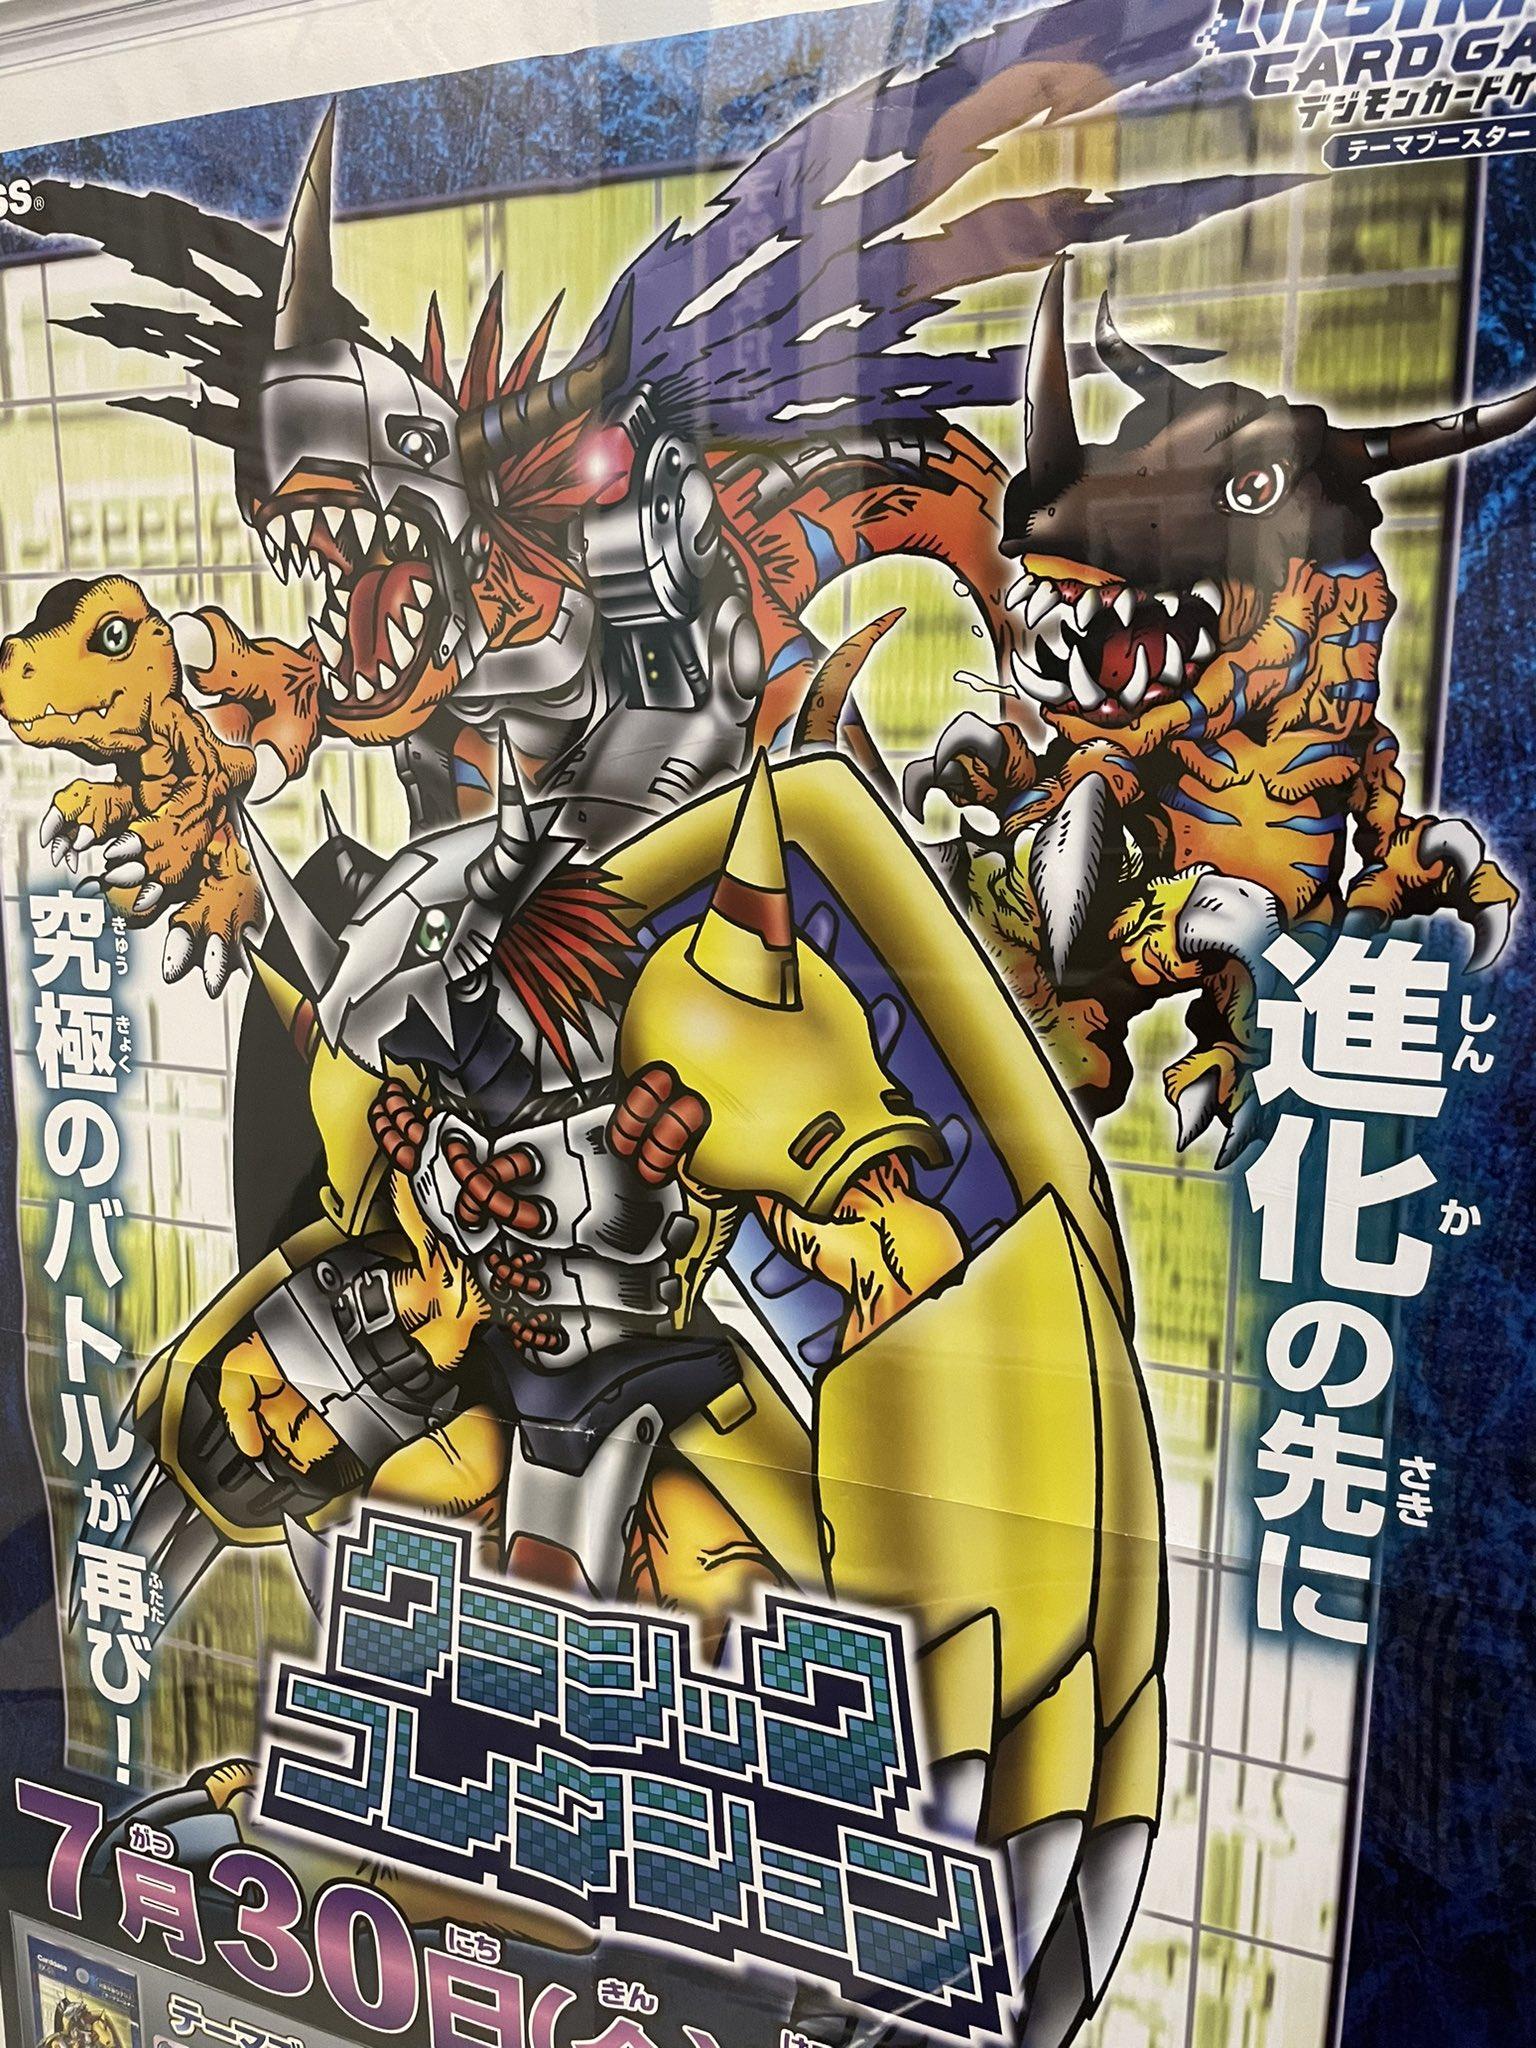 boosterex01_poster1_june29_2021.jpg